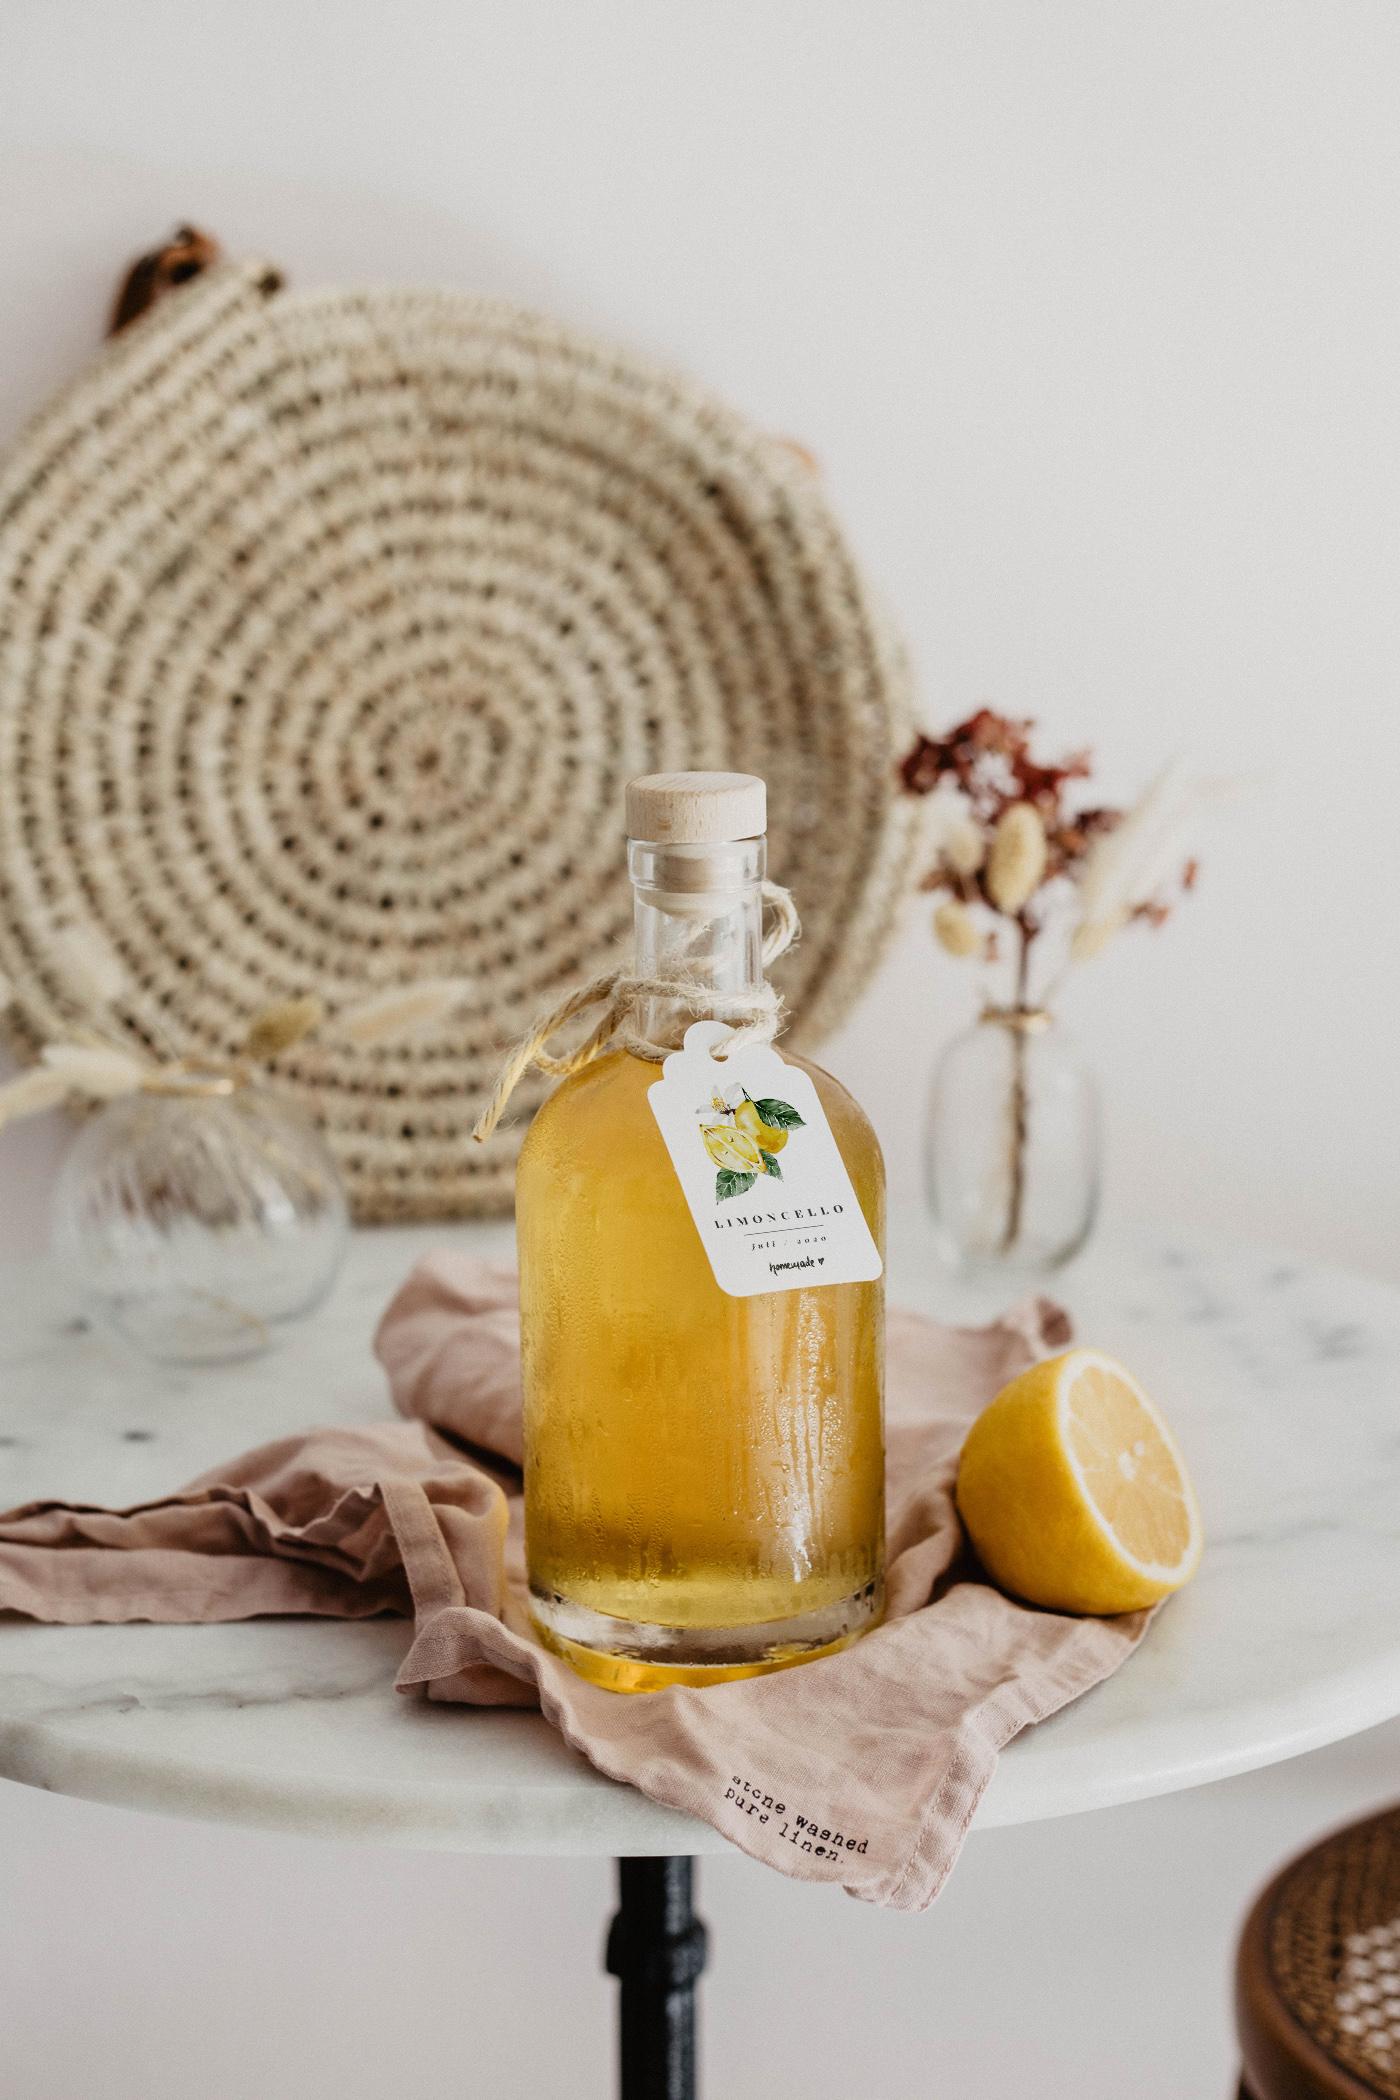 rezept limoncello selber machen